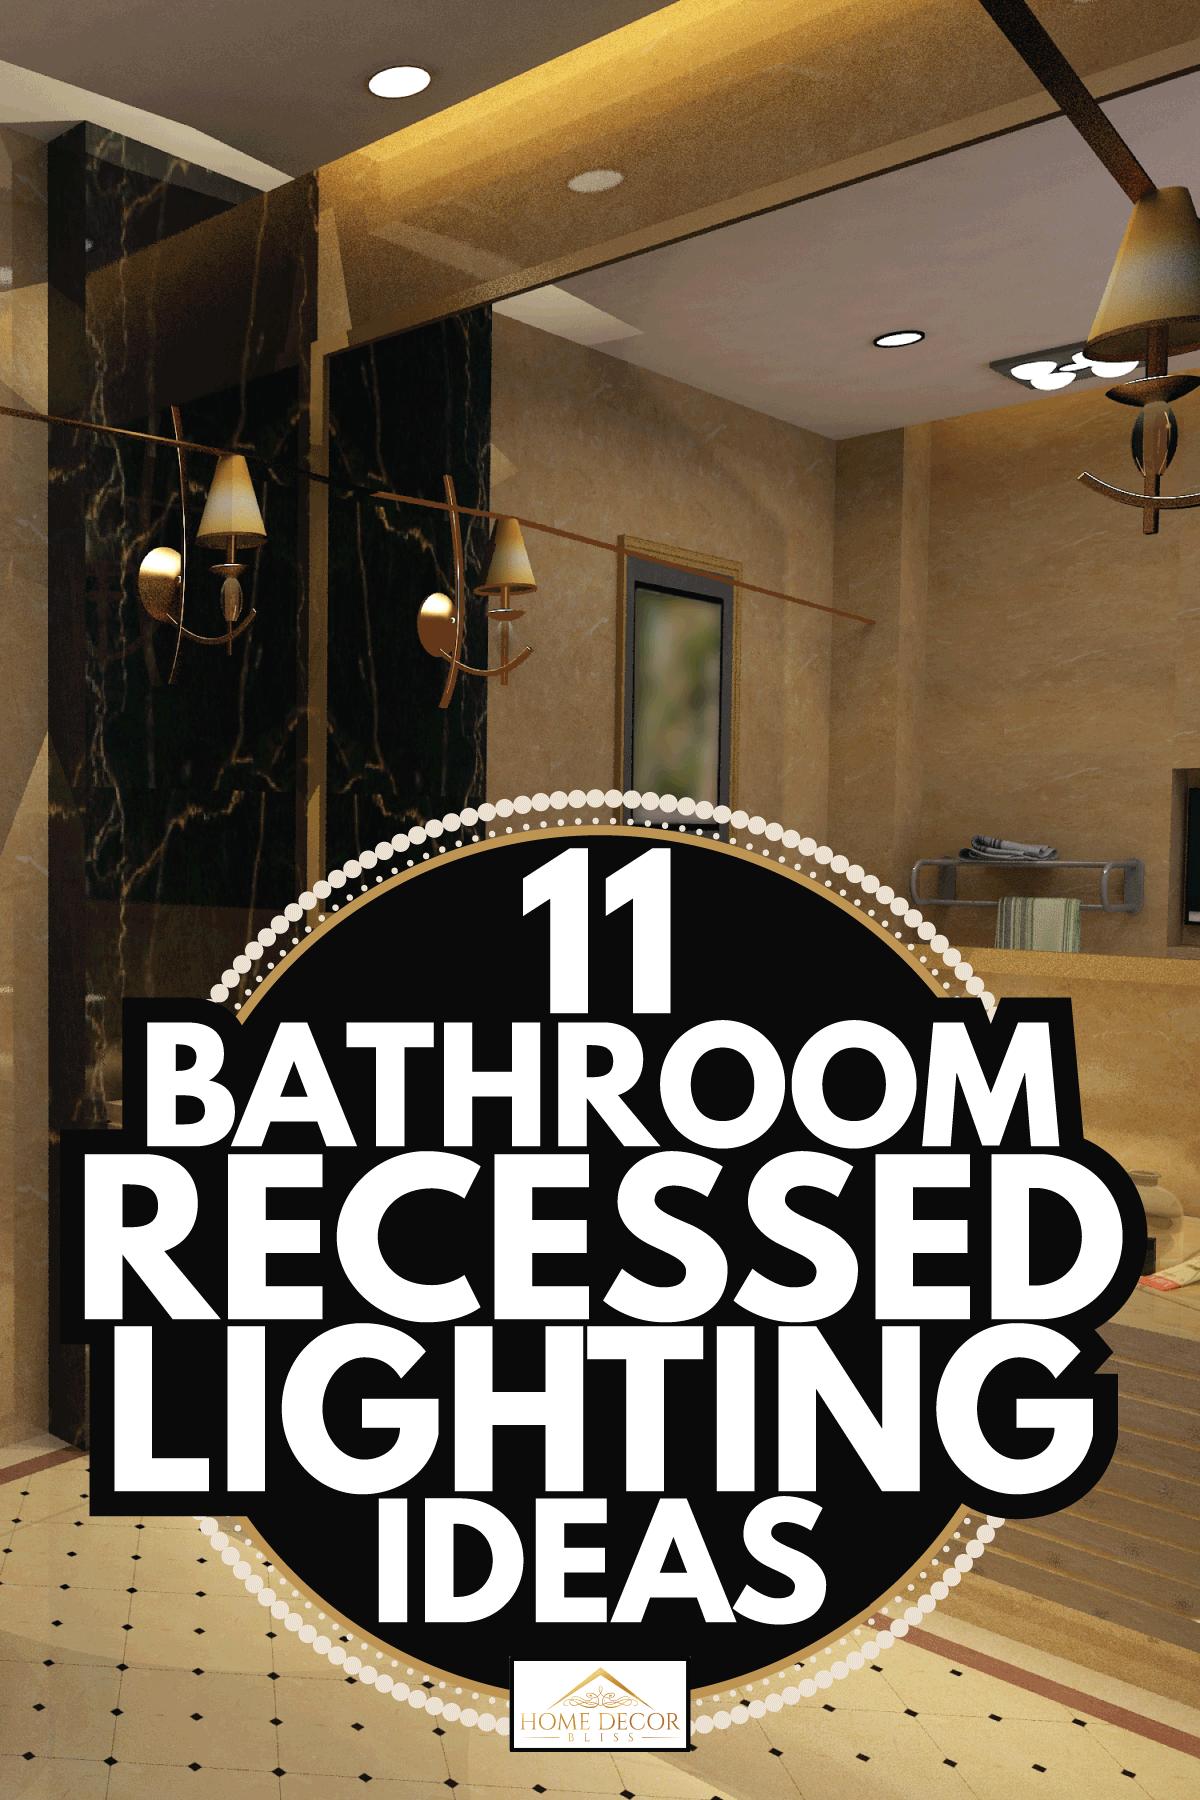 bathroom interior with large vanity mirror, warm lighting. 11 Bathroom Recessed Lighting Ideas